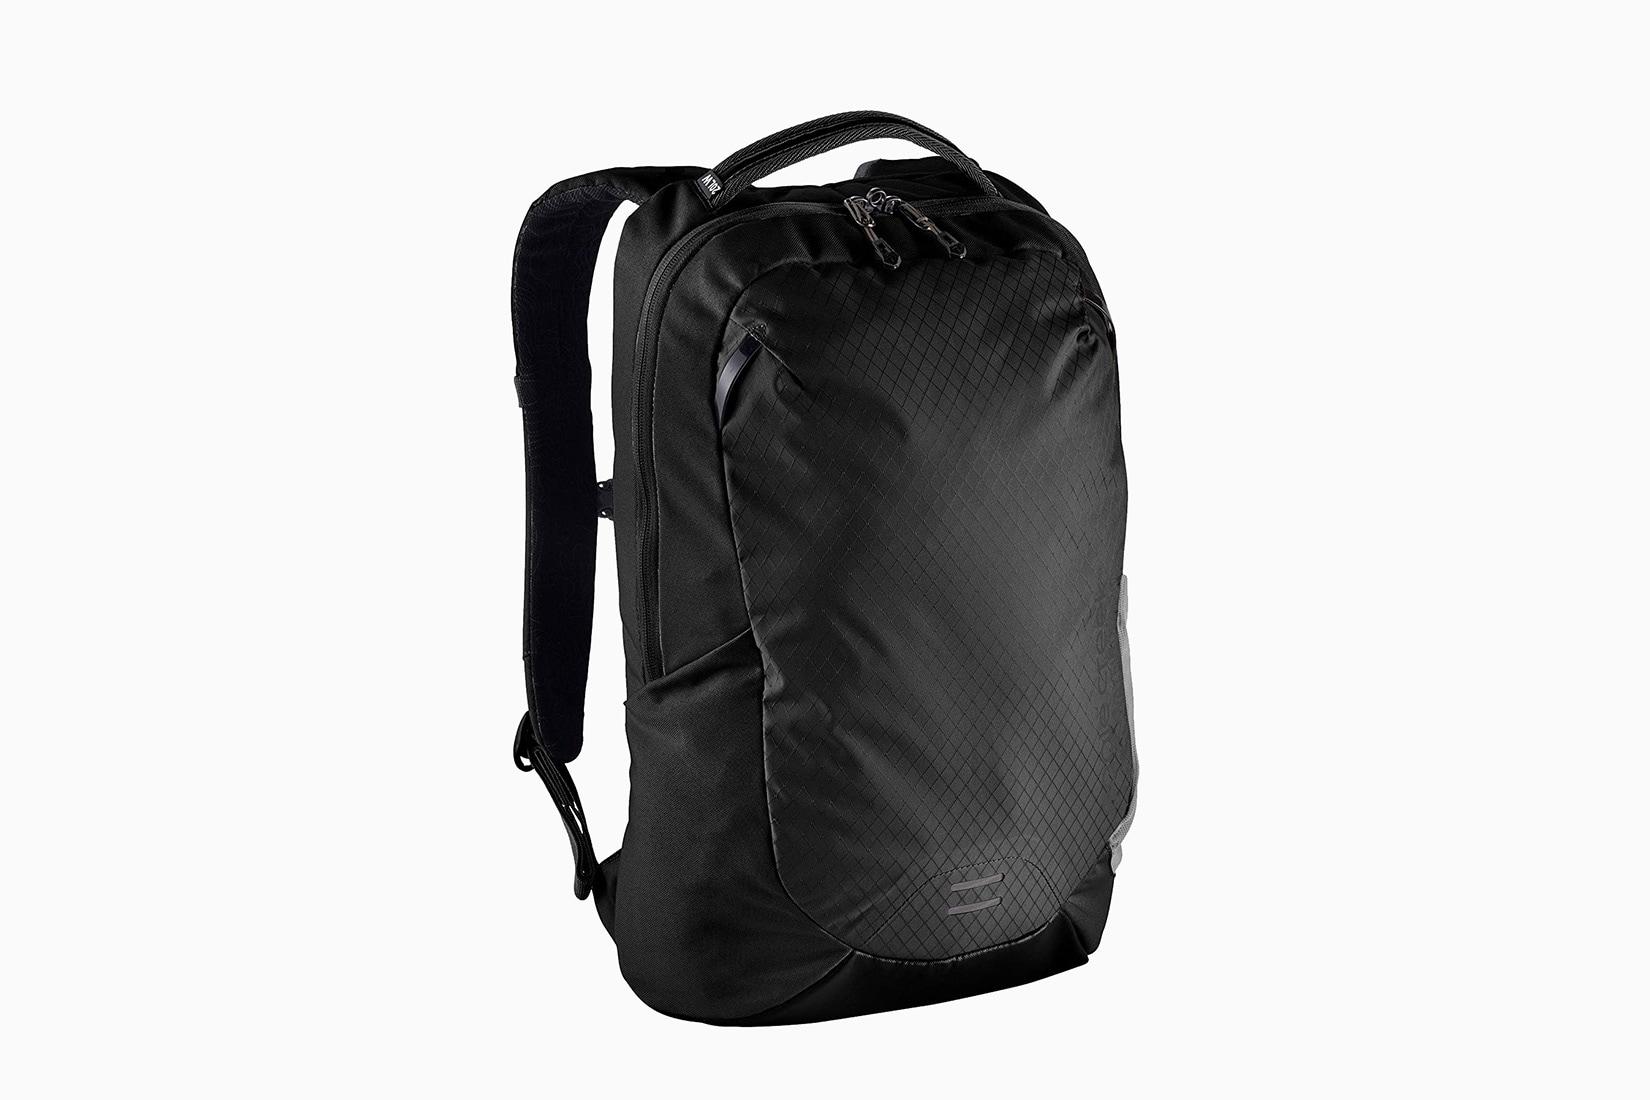 best travel backpack eagle creek wayfinder - Luxe Digital